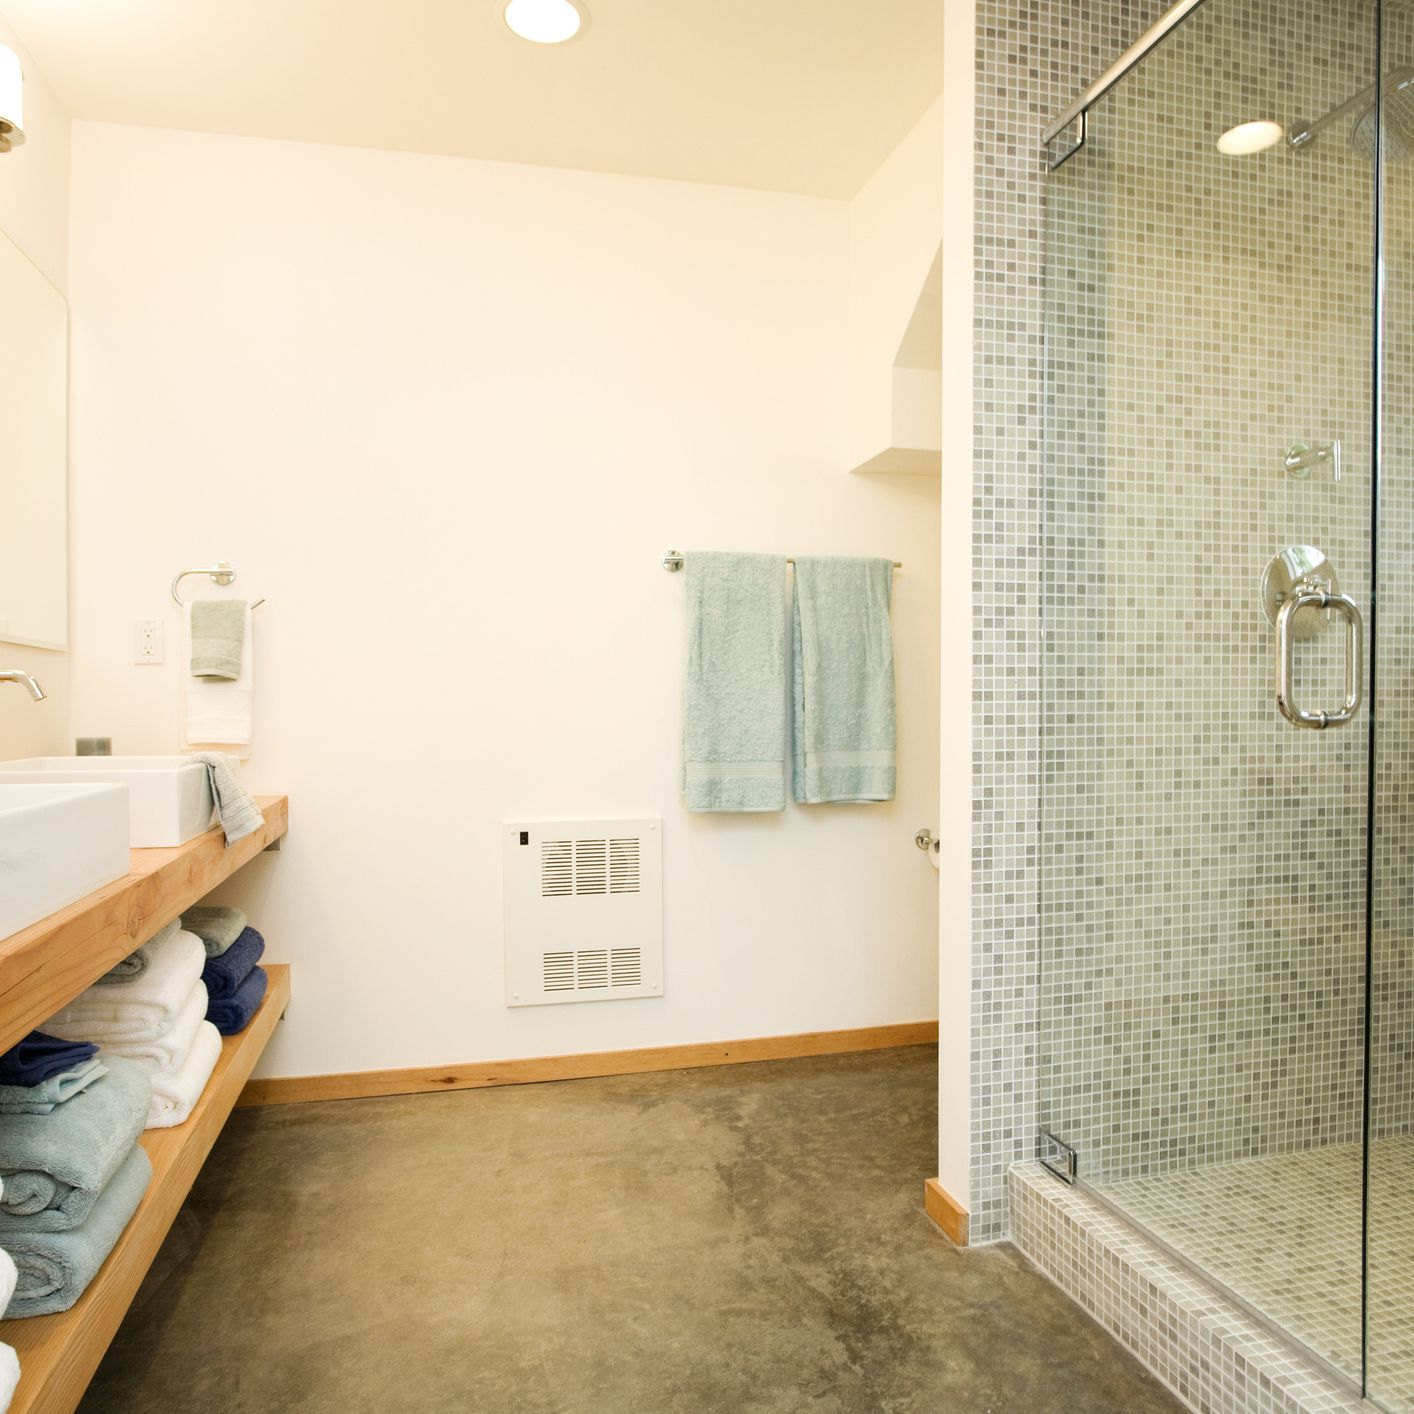 Concrete Bathroom Flooring Pros And Cons